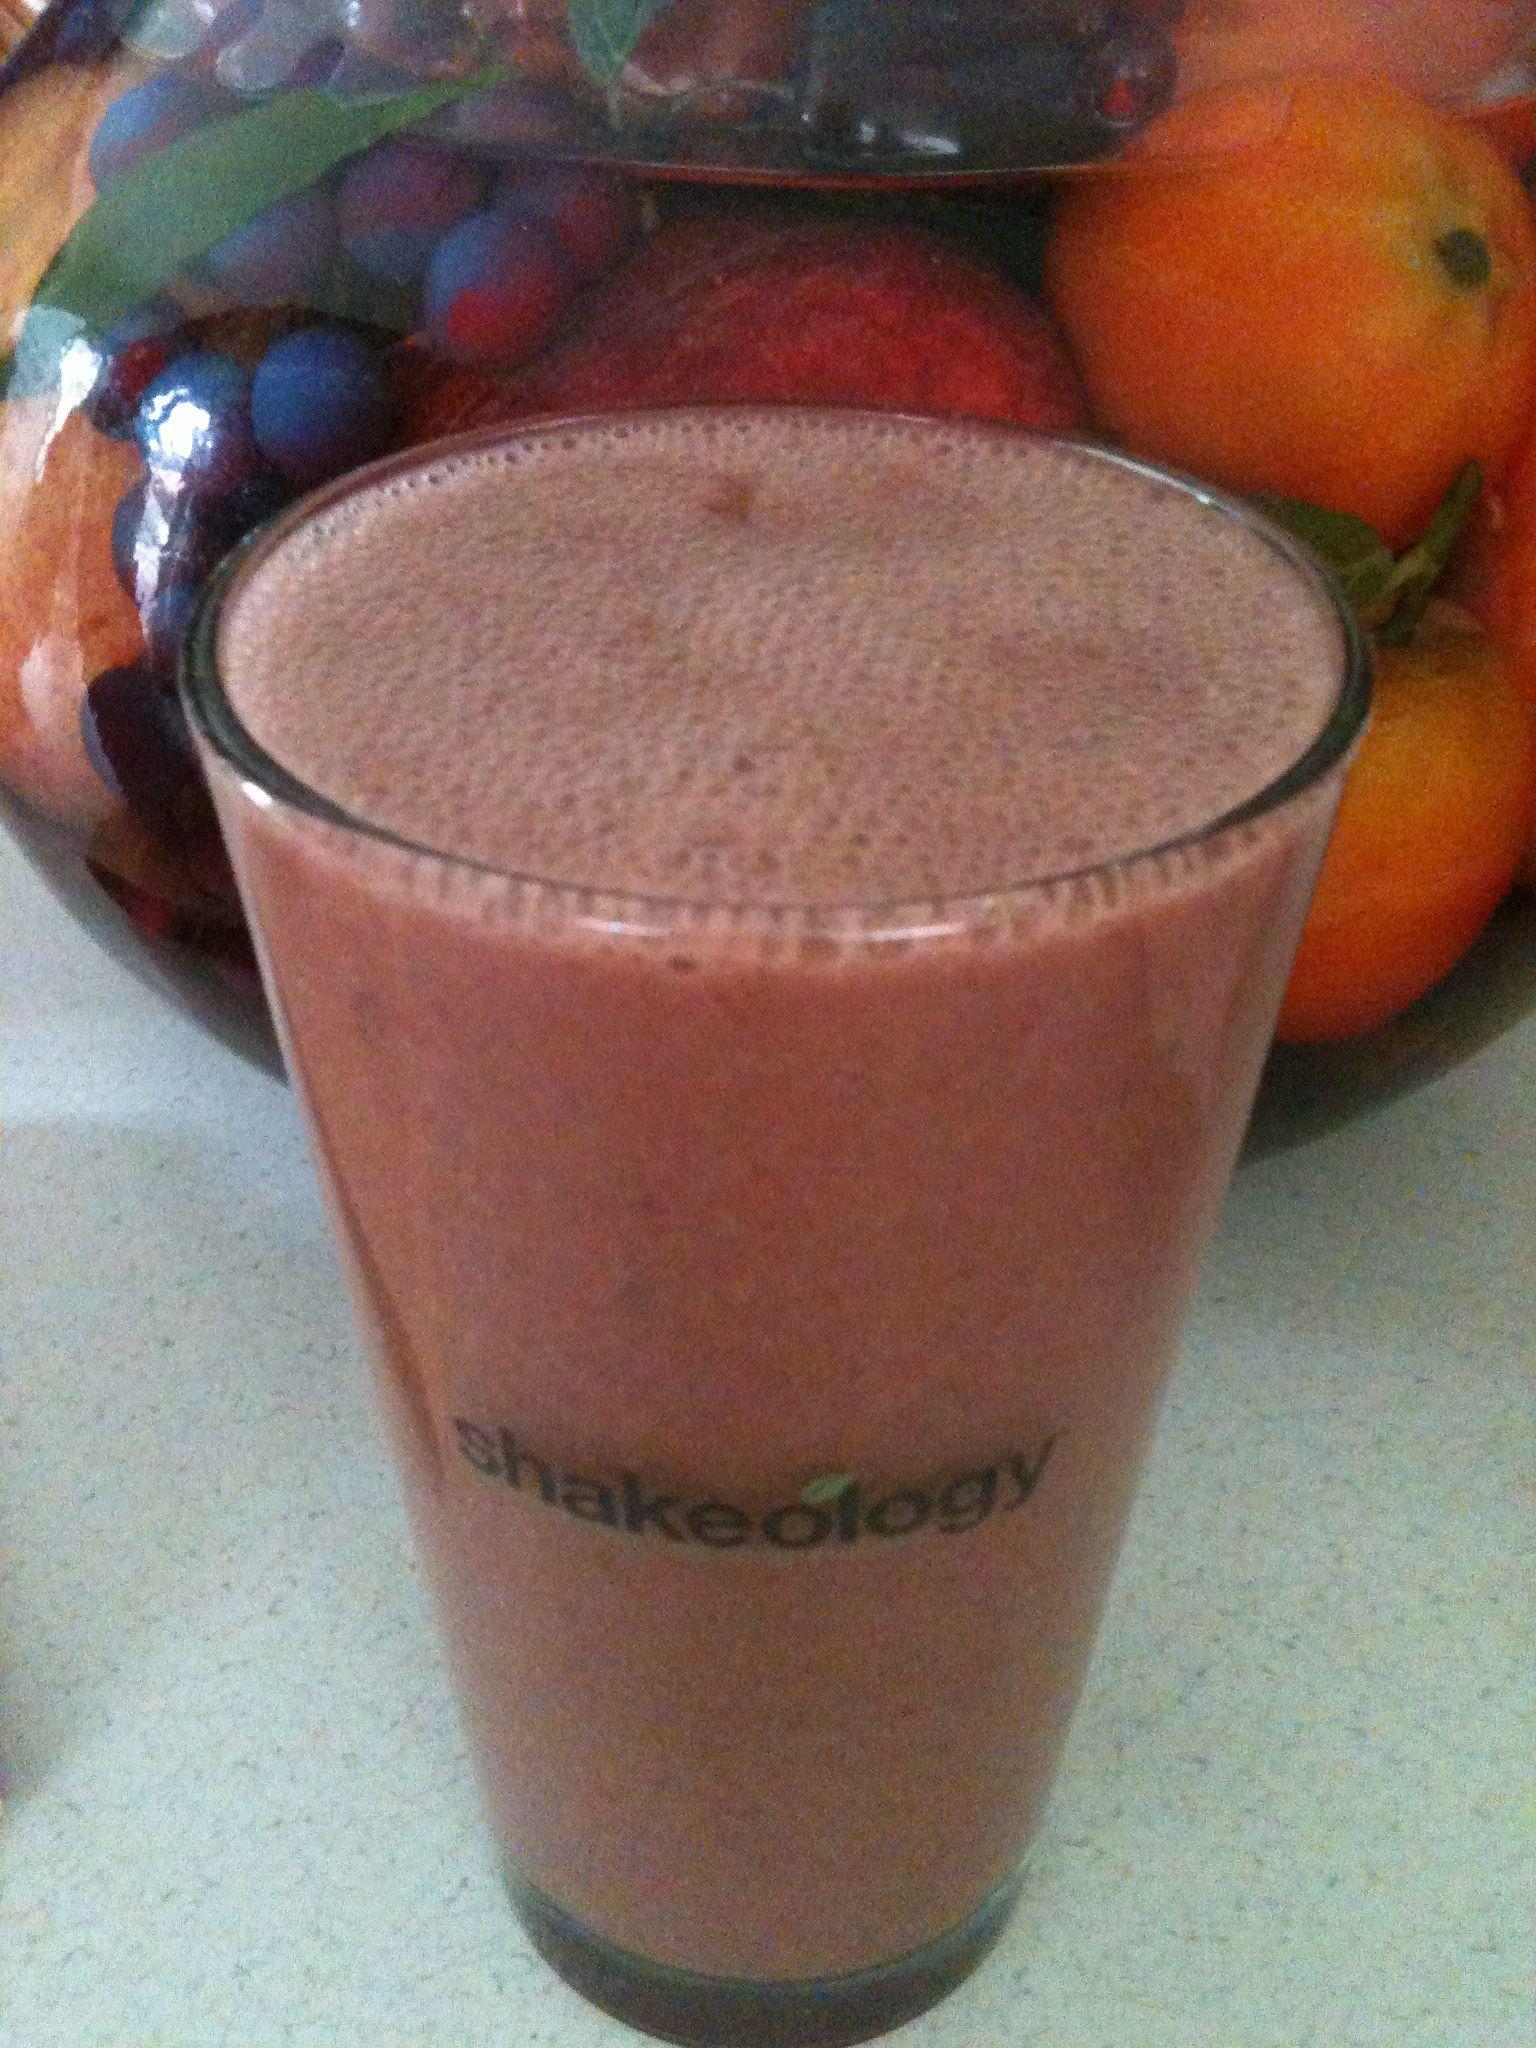 Strawberry Shakeology. Get yours at www.myshakeology.com/RockyJ